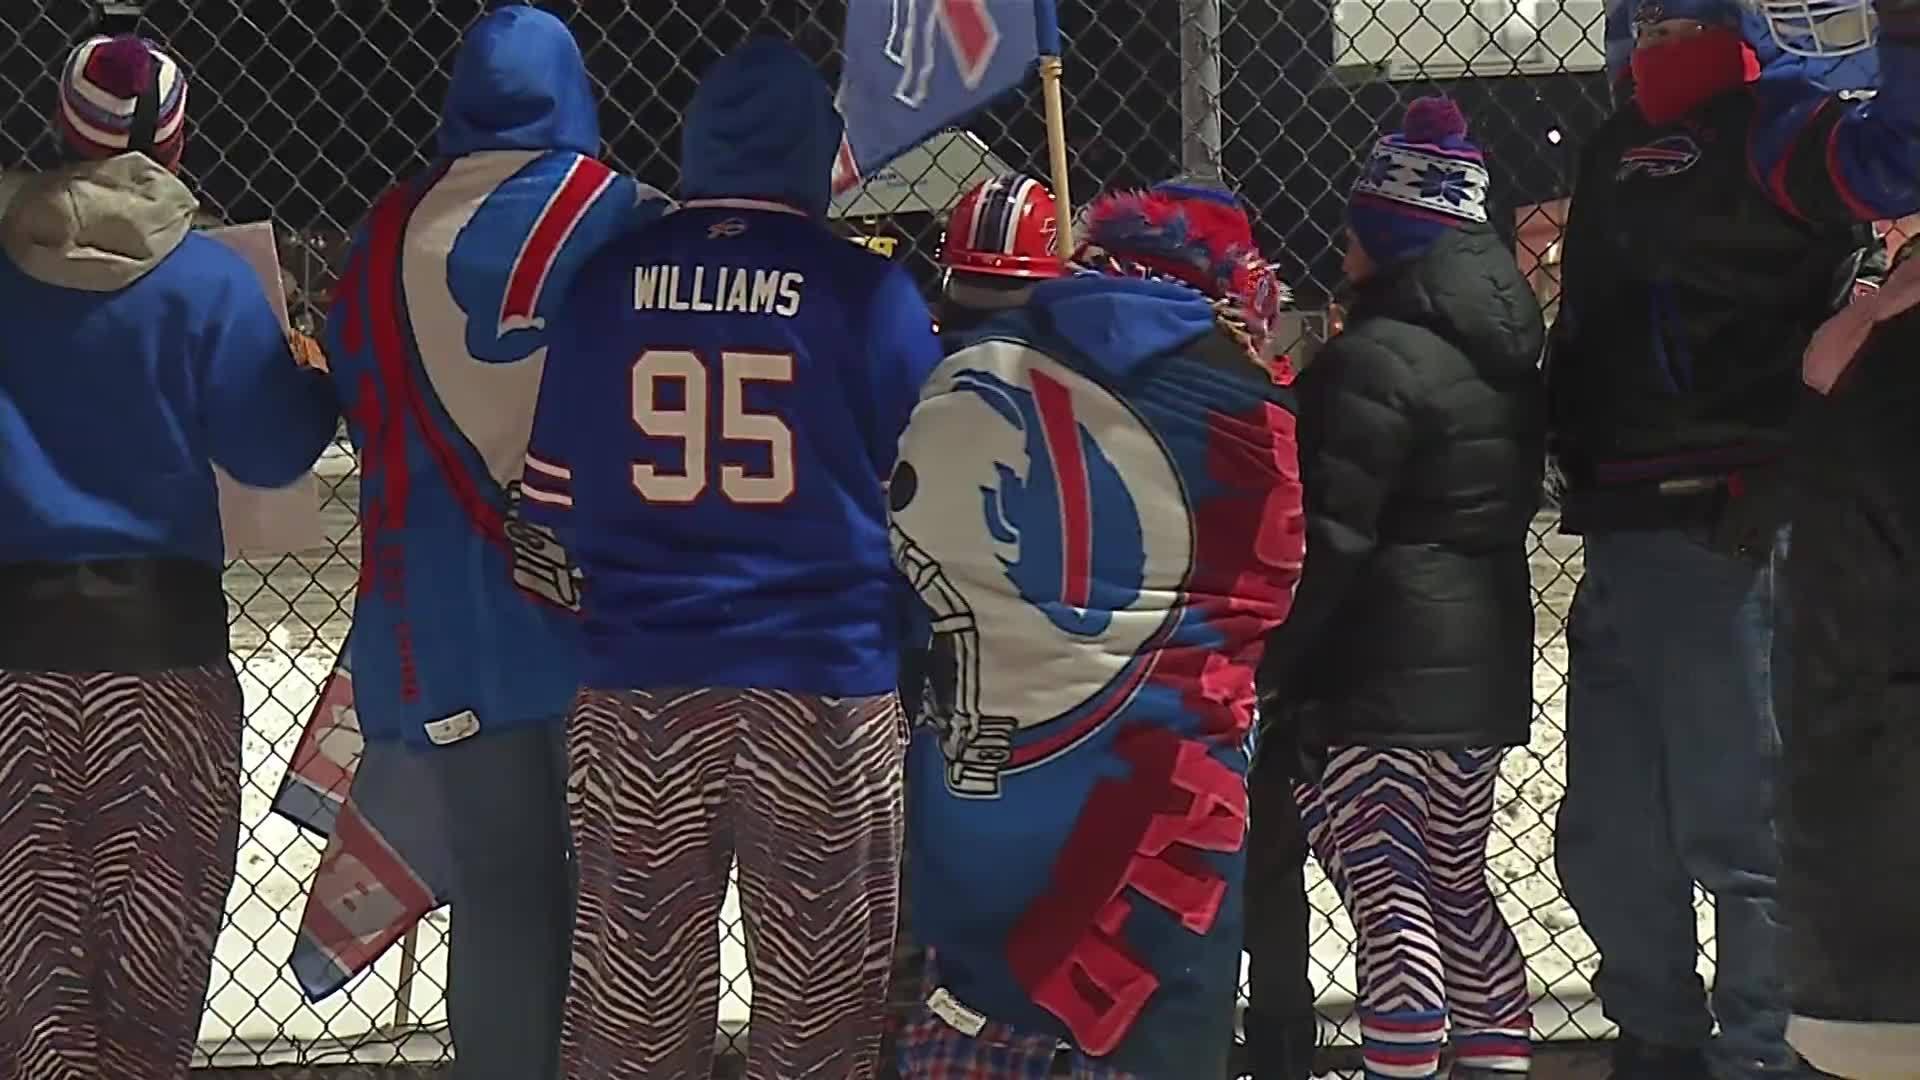 Buffalo_Bills_greeted_by_fans_arriving_b_0_20180108173920-118809282